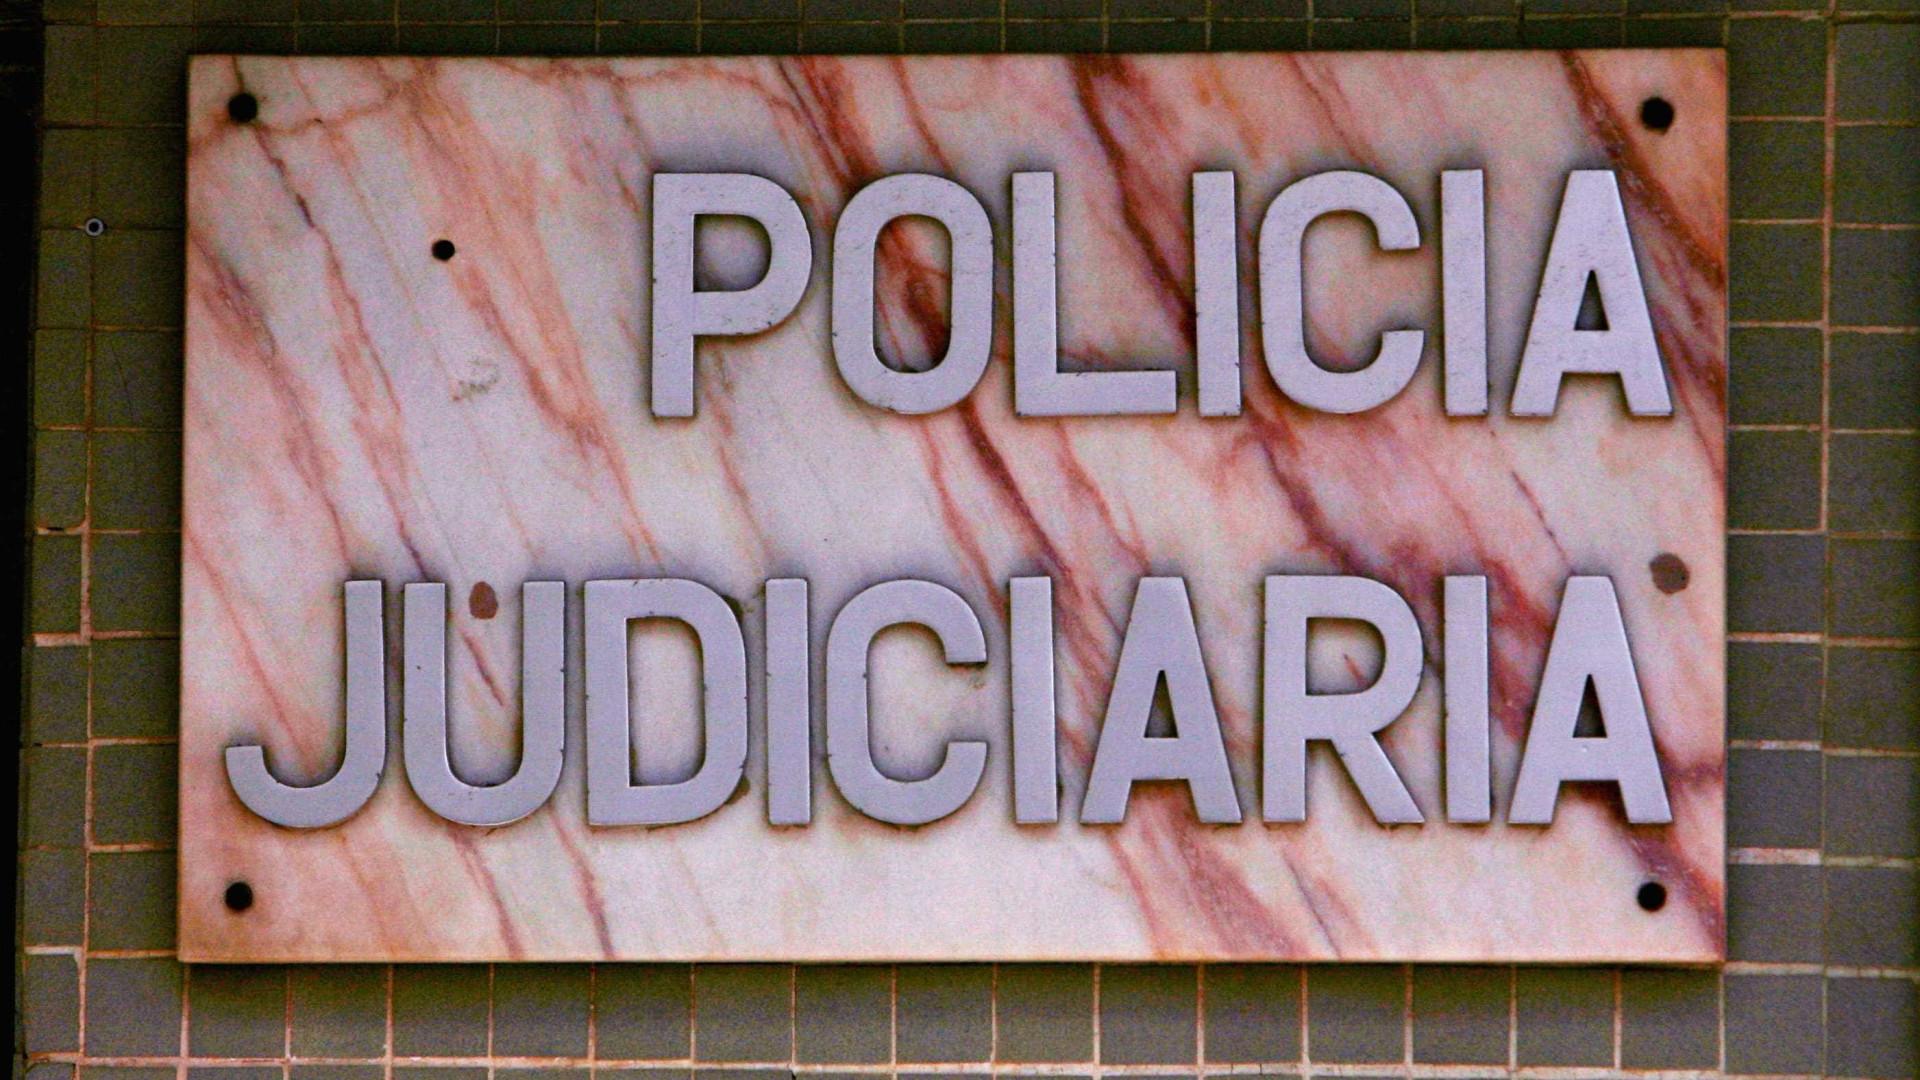 Suspeito de violência doméstica acaba detido por posse de armas proibidas